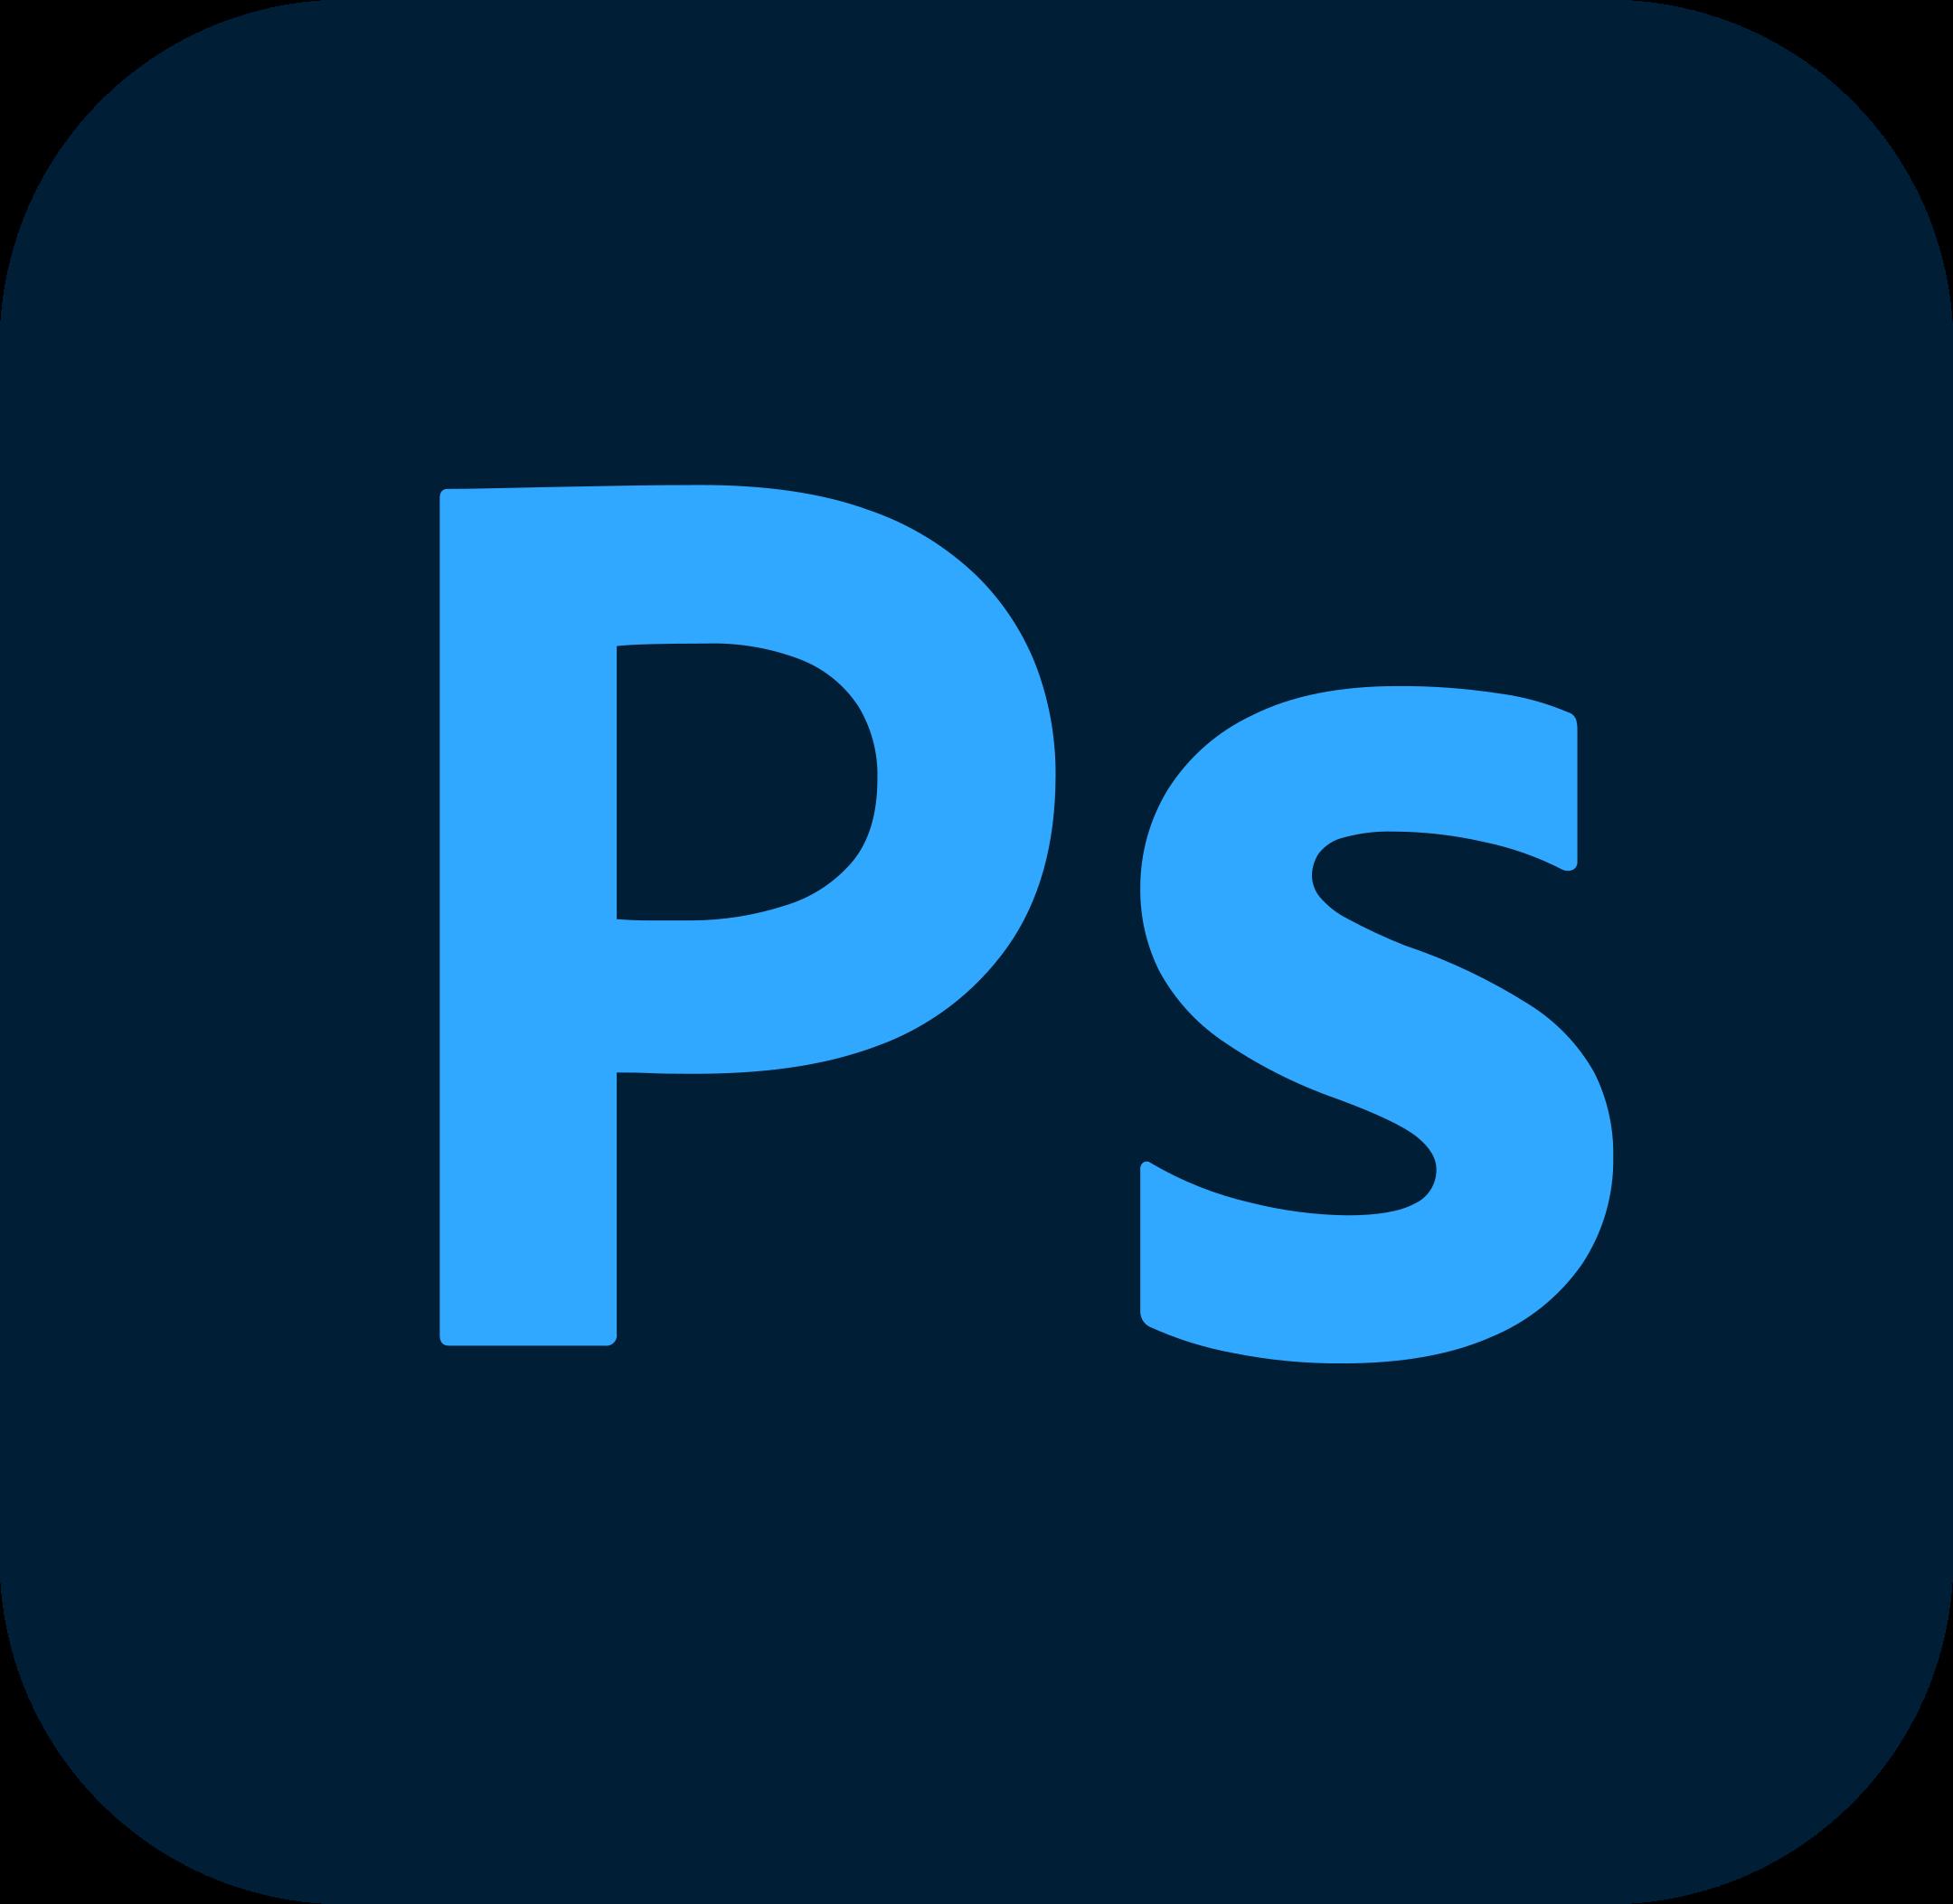 adobe photoshop logo 1 - Adobe Photoshop Logo